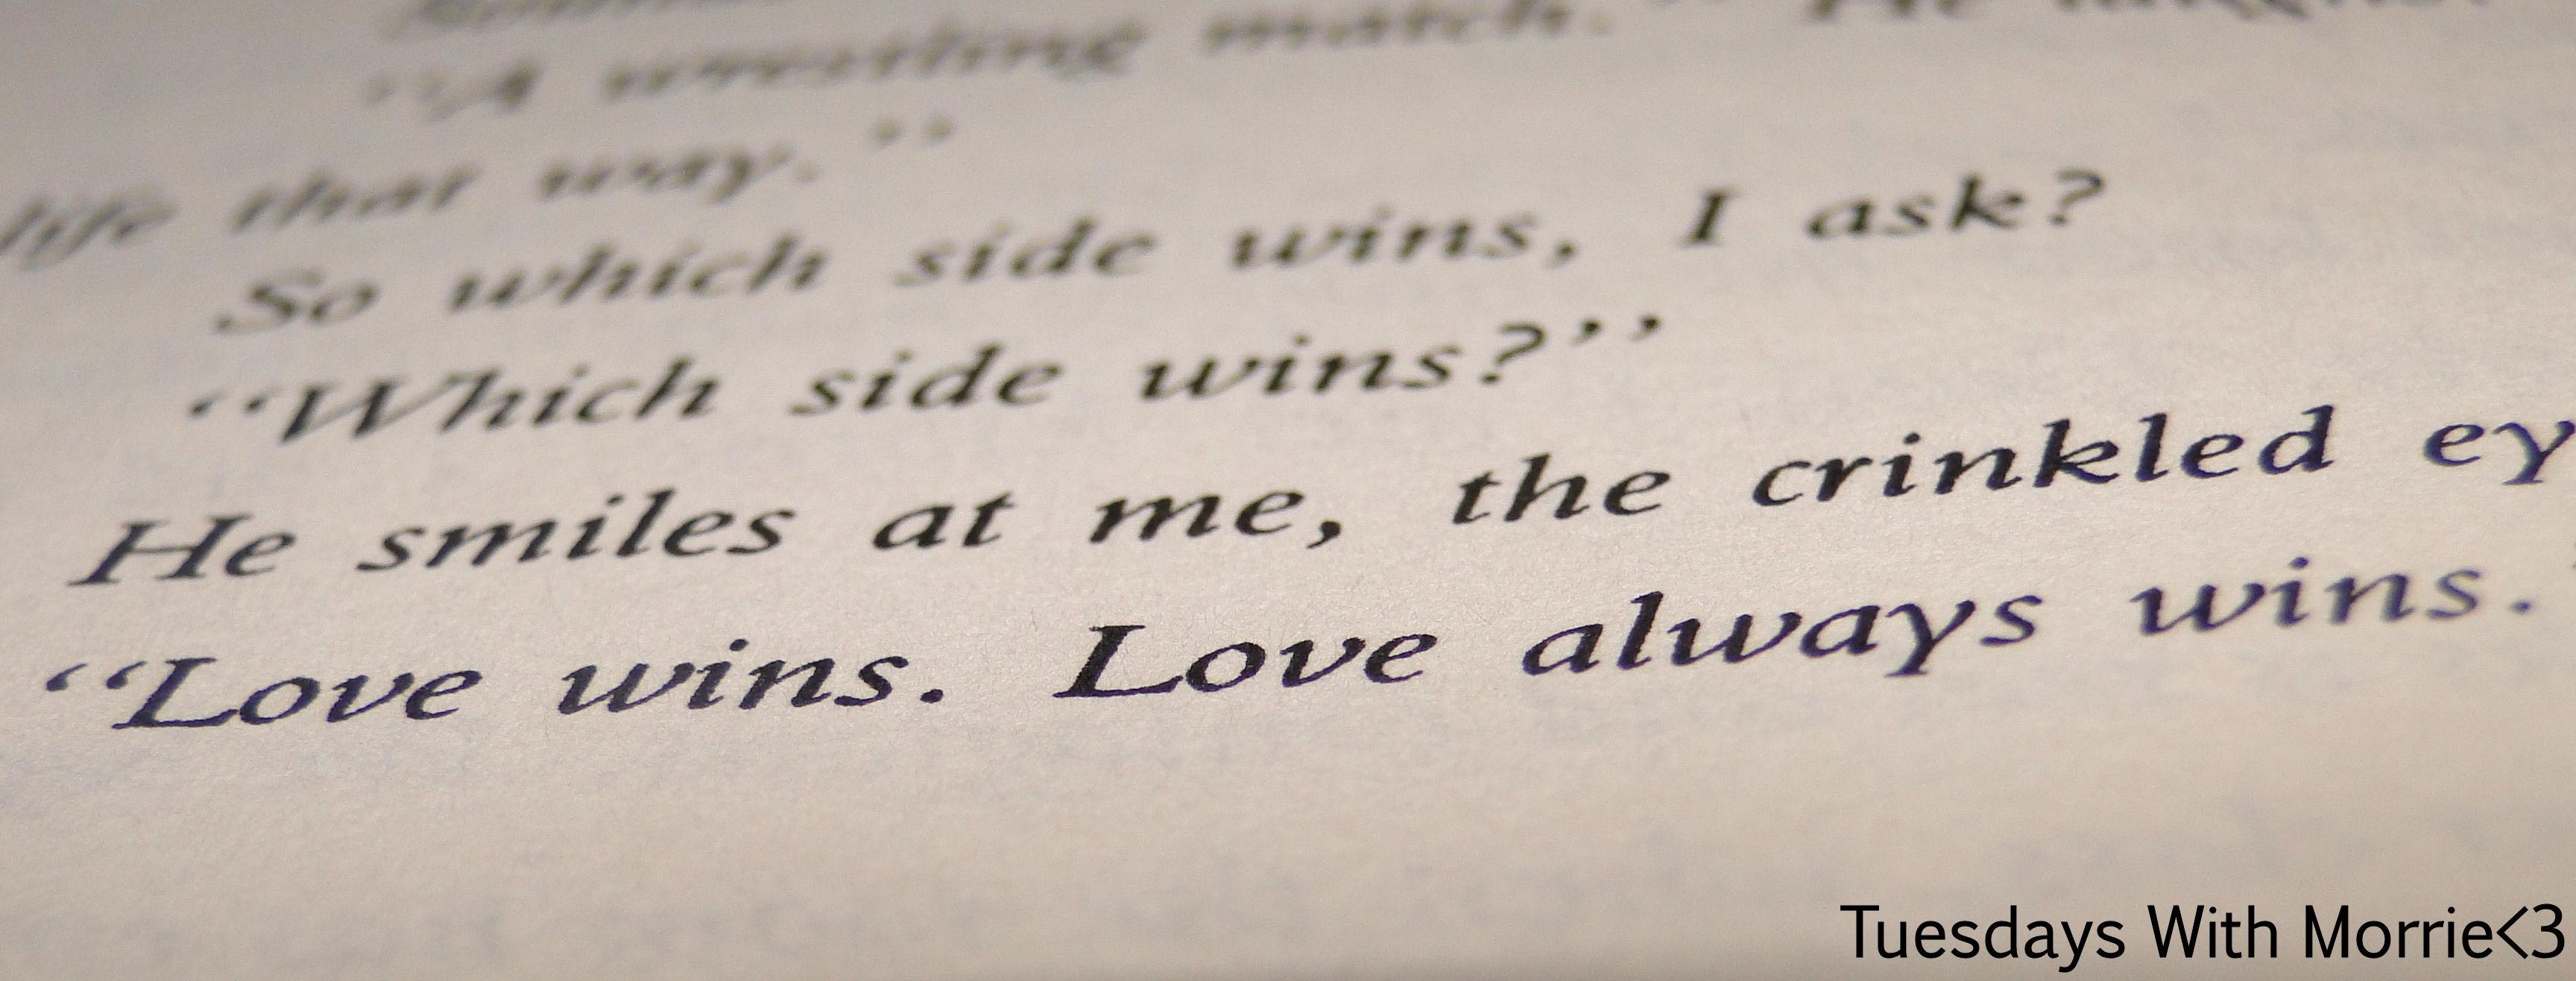 Love Wins. Love Always Wins. by DiamondInTheRoughX on ...